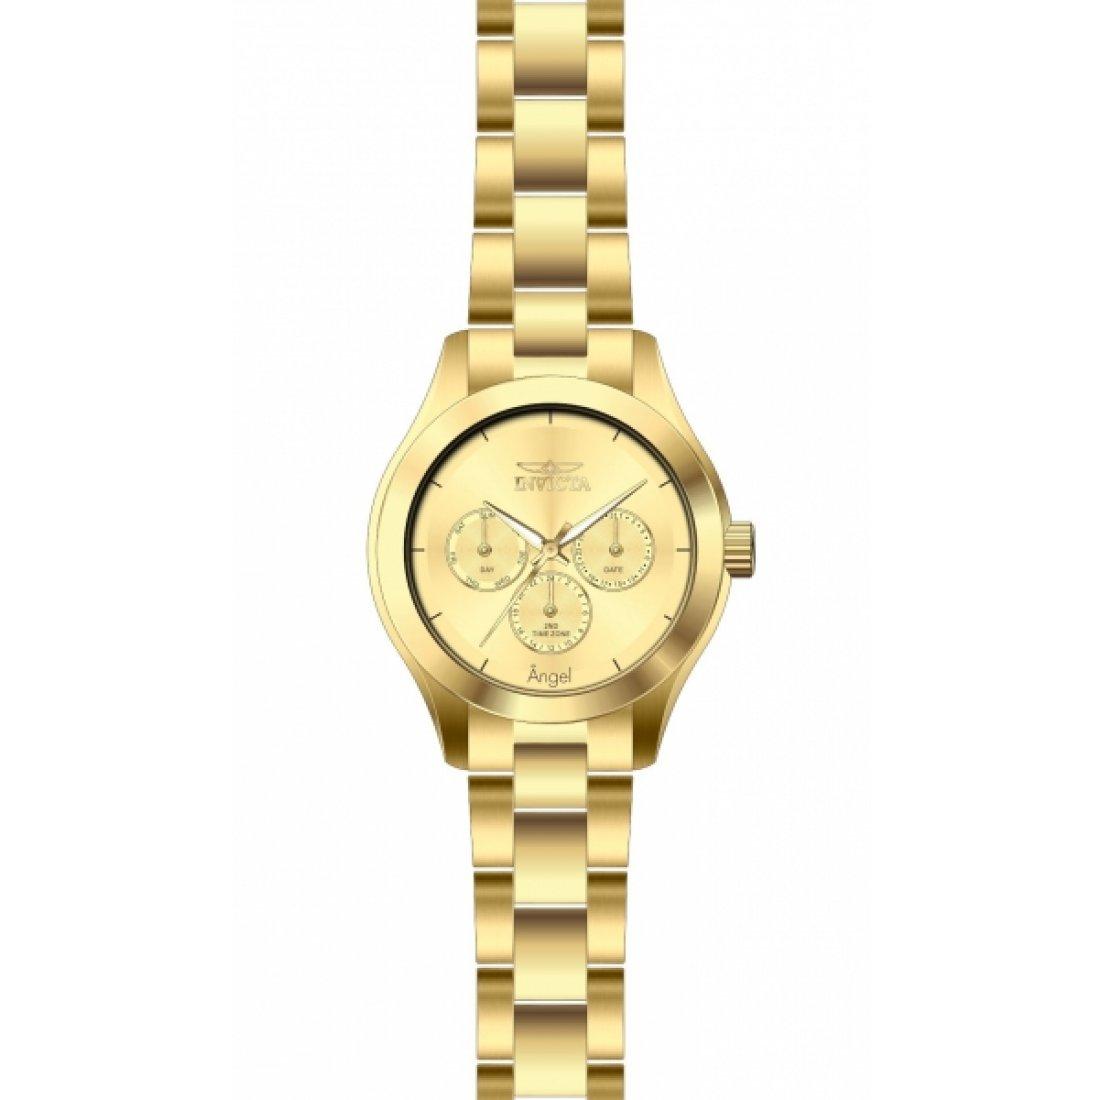 Invicta Angel 12466   Anny van Buul Juweliers Horloges 7ff58e4c8a8